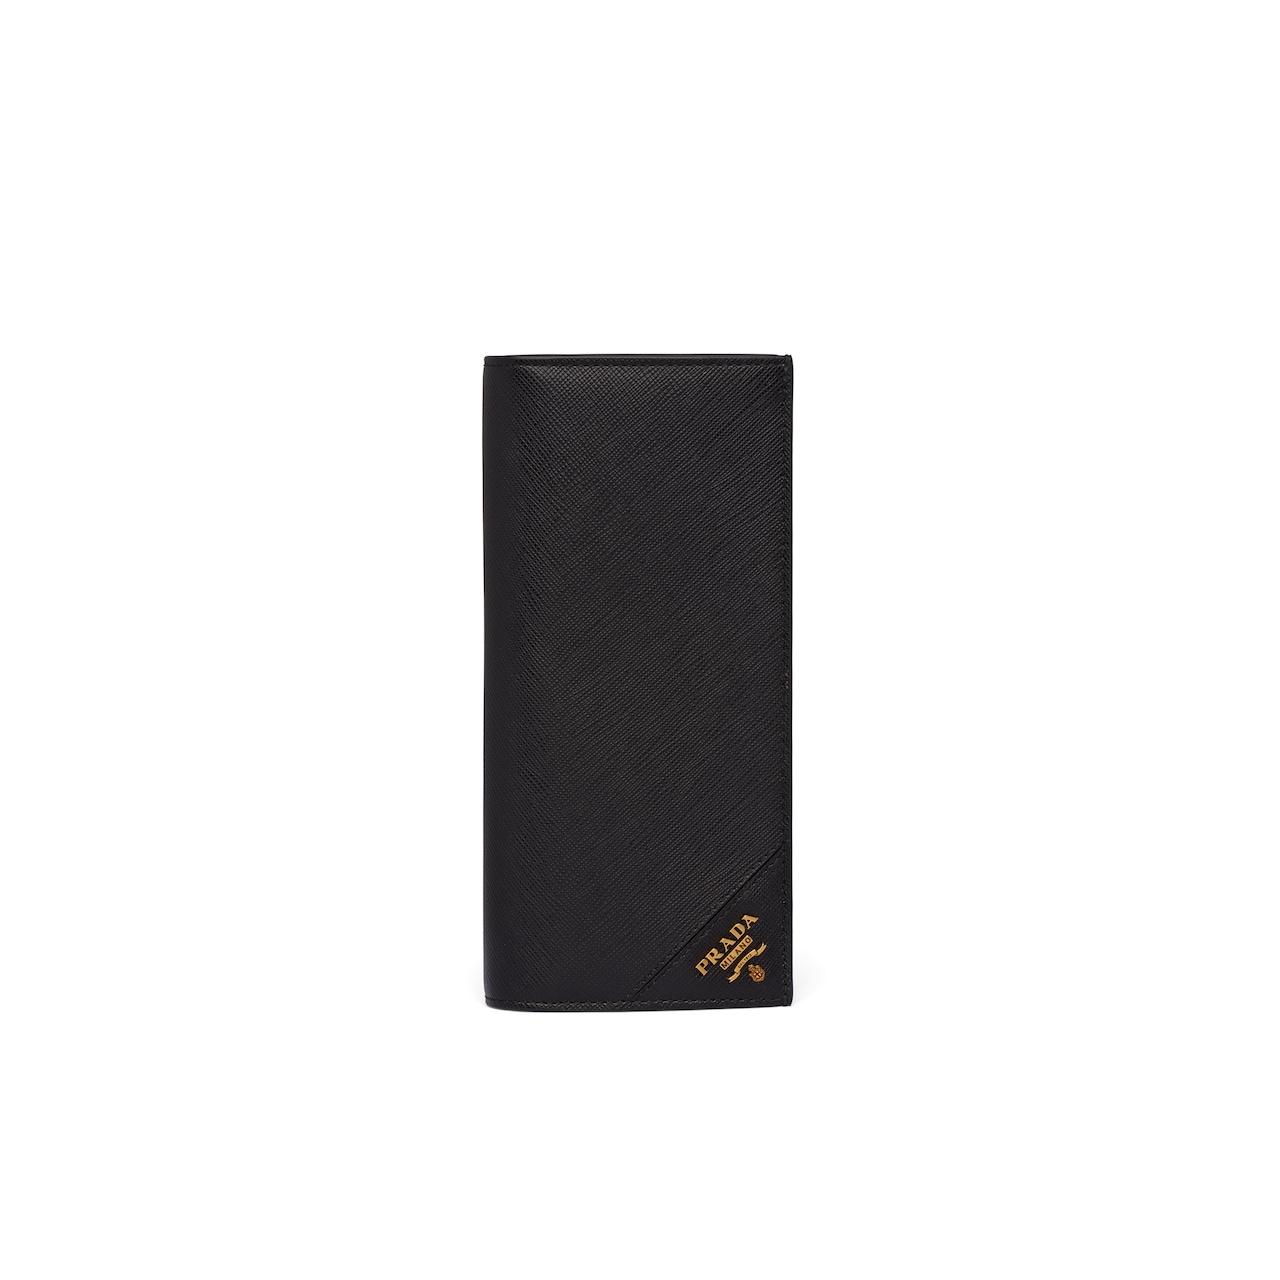 Prada Document Holder 1